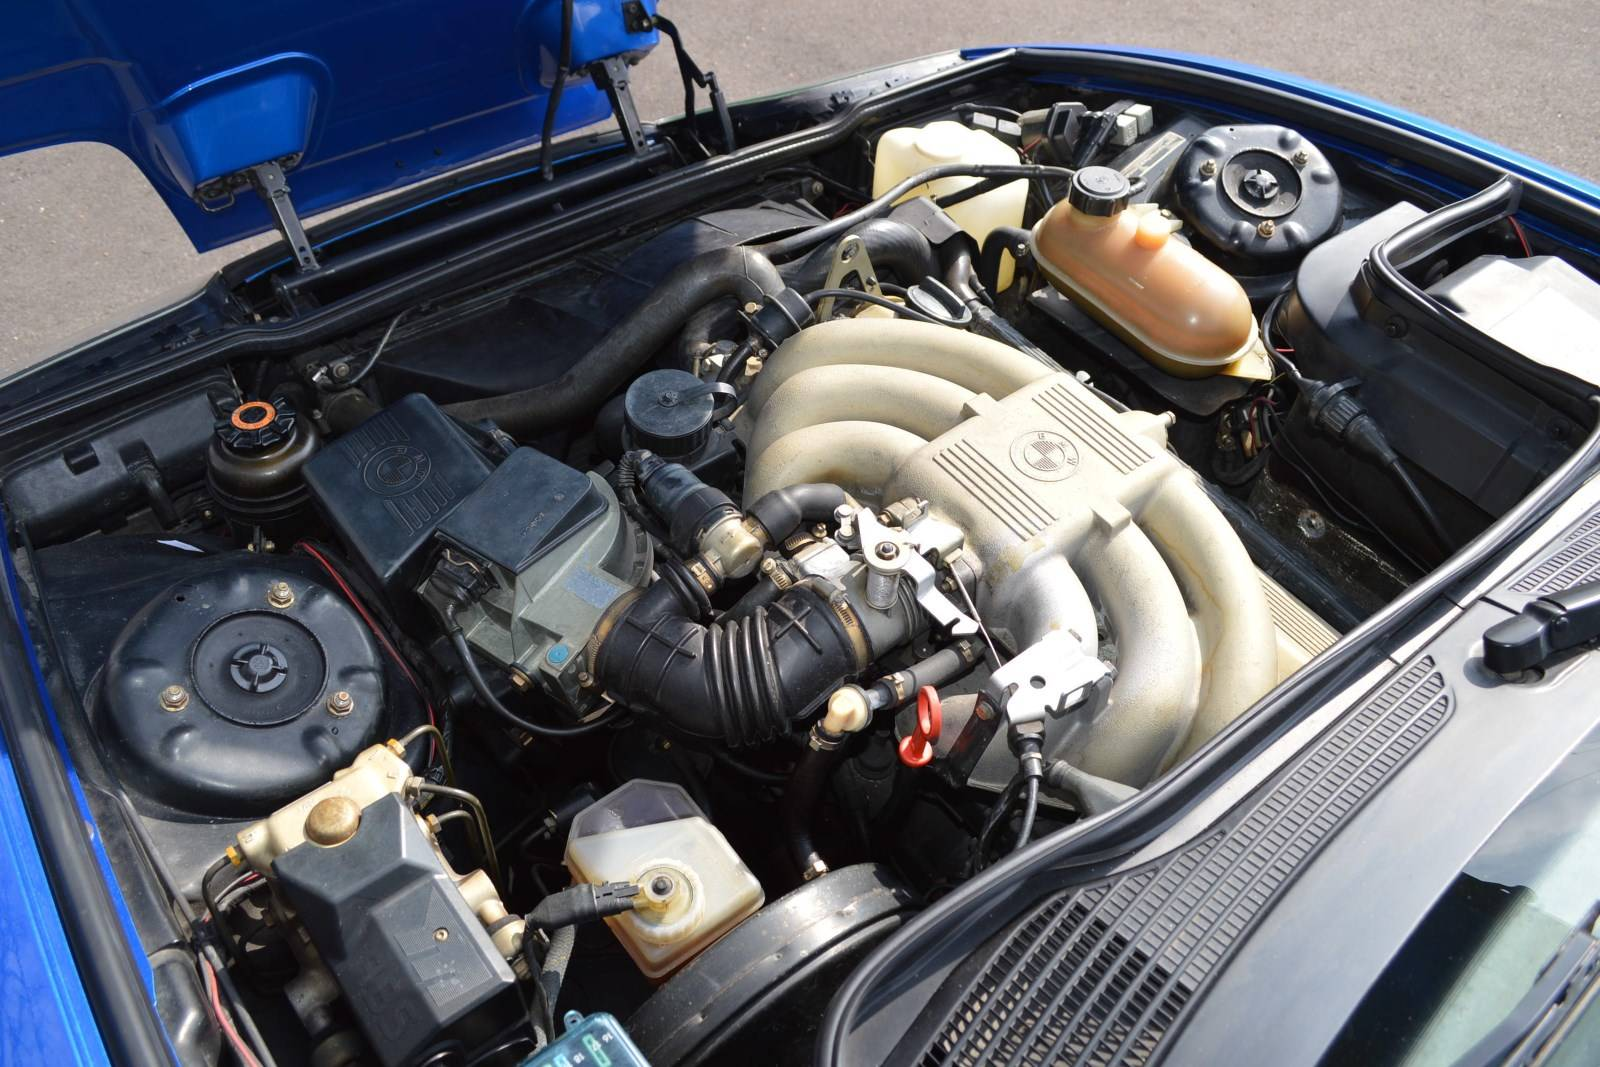 30-летие BMW ALPINA Roadster Limited Edition - BMW Z1 E30 6